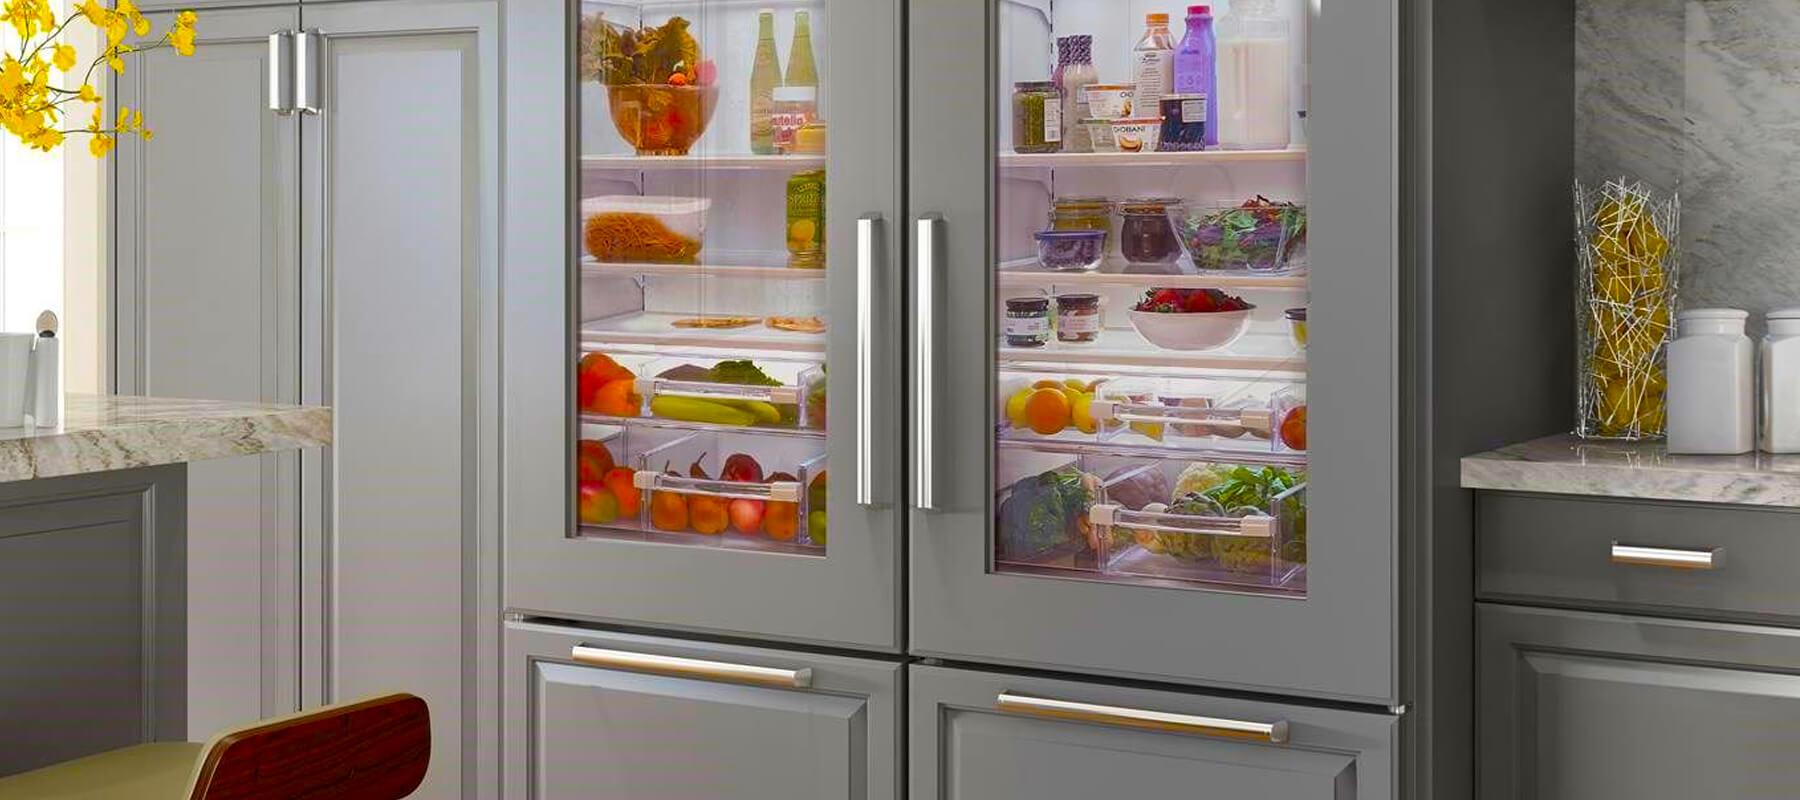 Built in Wine Refrigerator Altadena | Built-in Refrigerator Repair